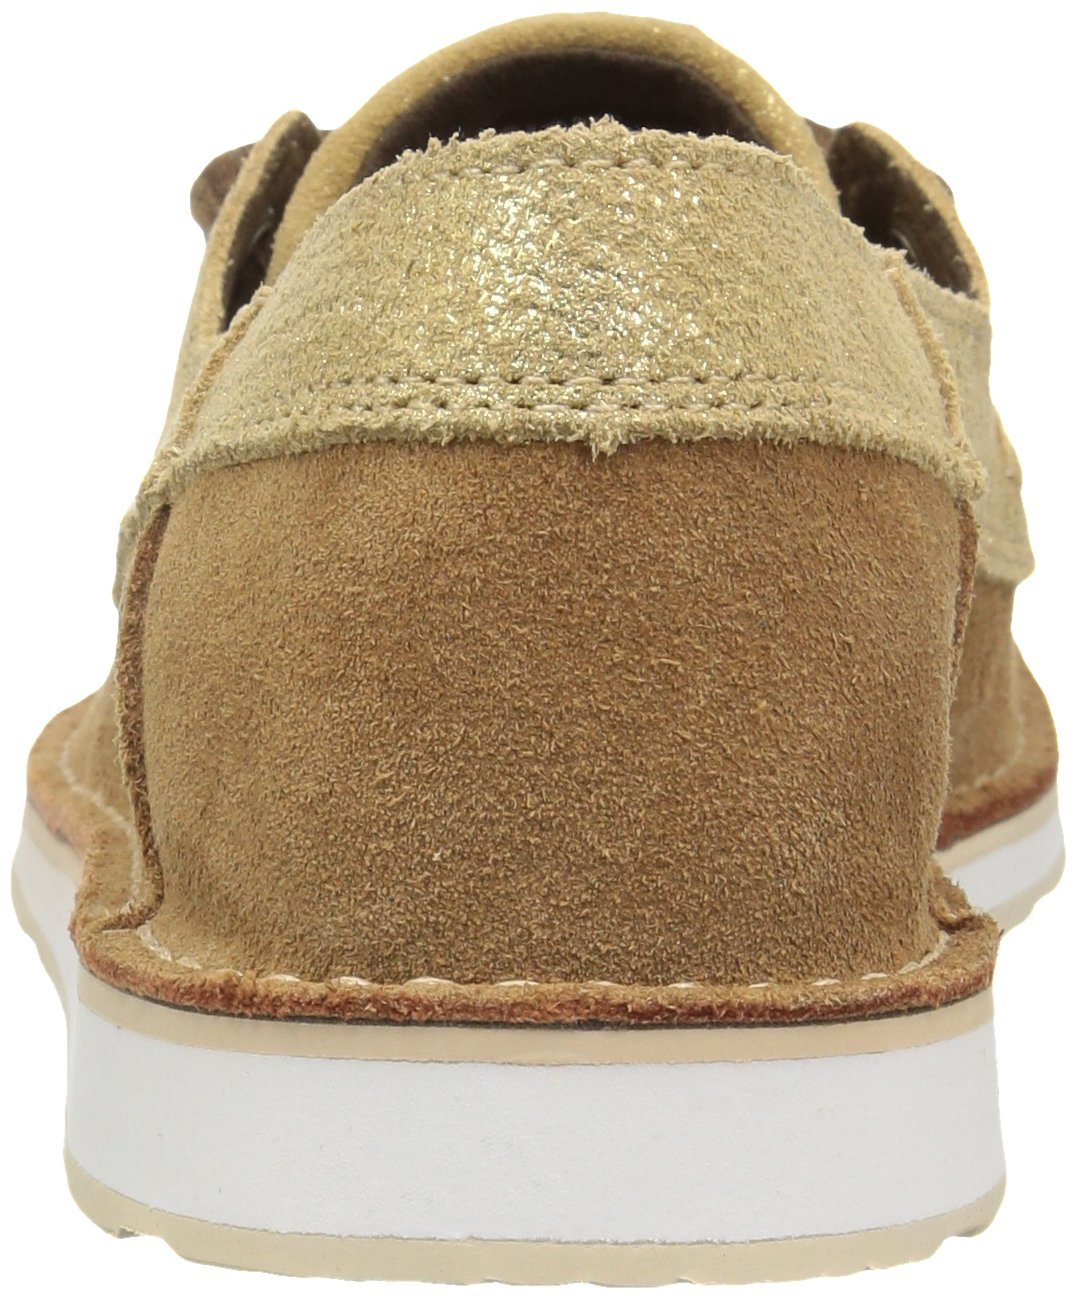 Ariat Women's Cruiser Slip-on Shoe B071ZHKF7R 11 B(M) US Rustic Bark/Sparklin' Gold